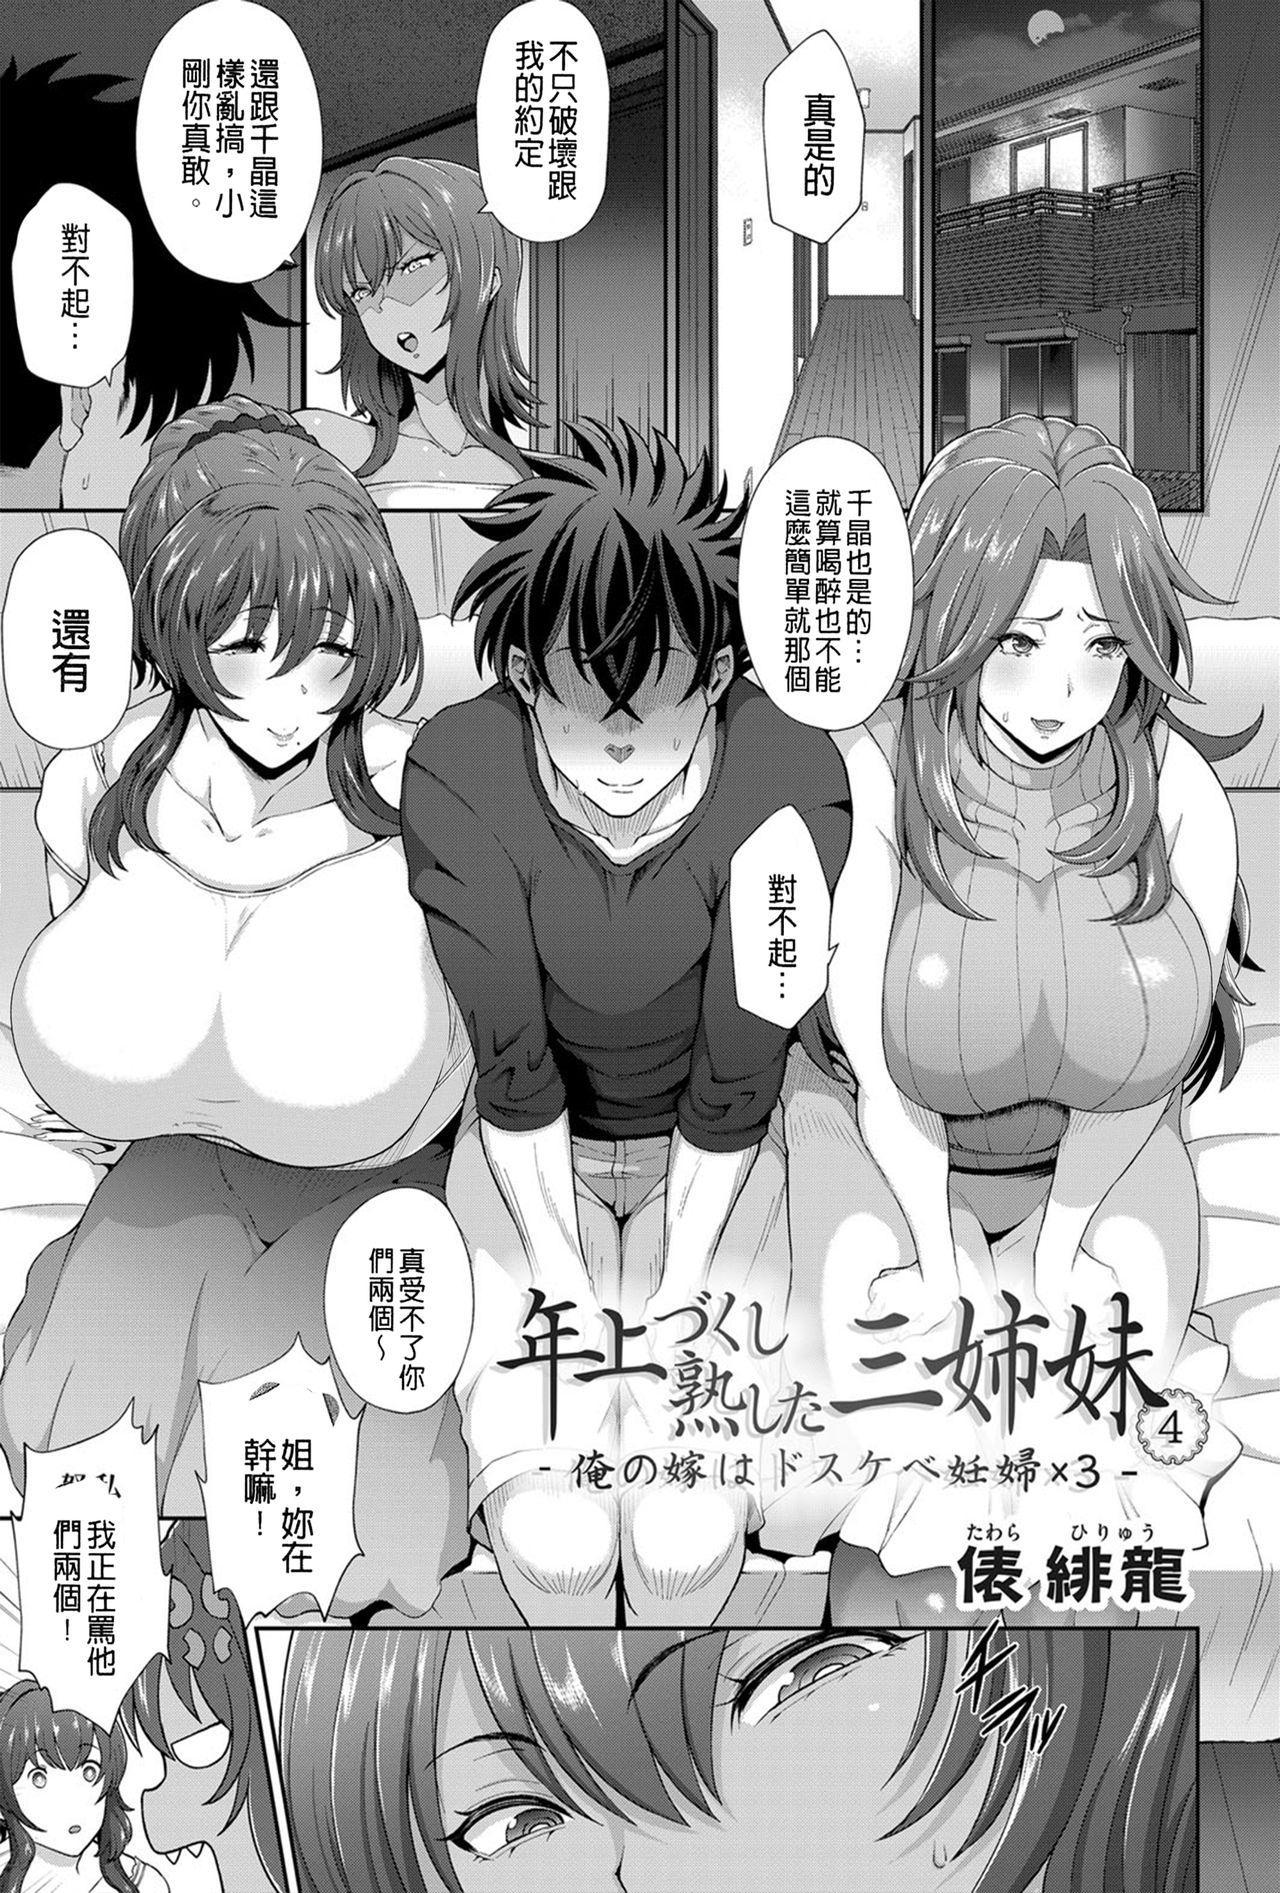 Juku Mesu - Erotic Mature Women 77